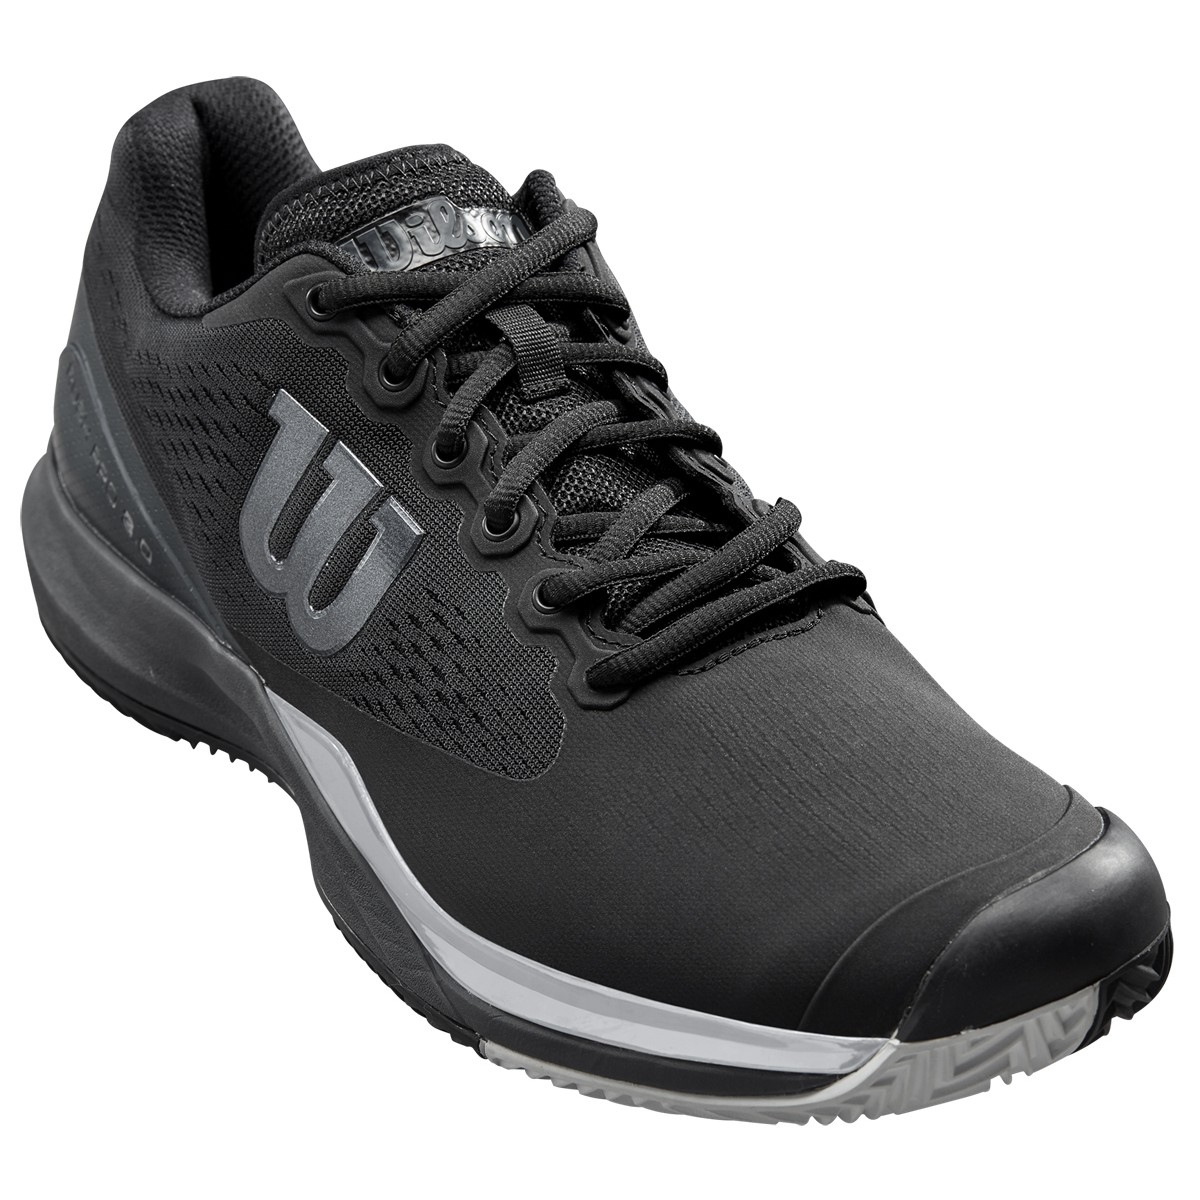 sports shoes e8e17 891a7 WILSON RUSH PRO 3.0 CLAY COURT SHOES +